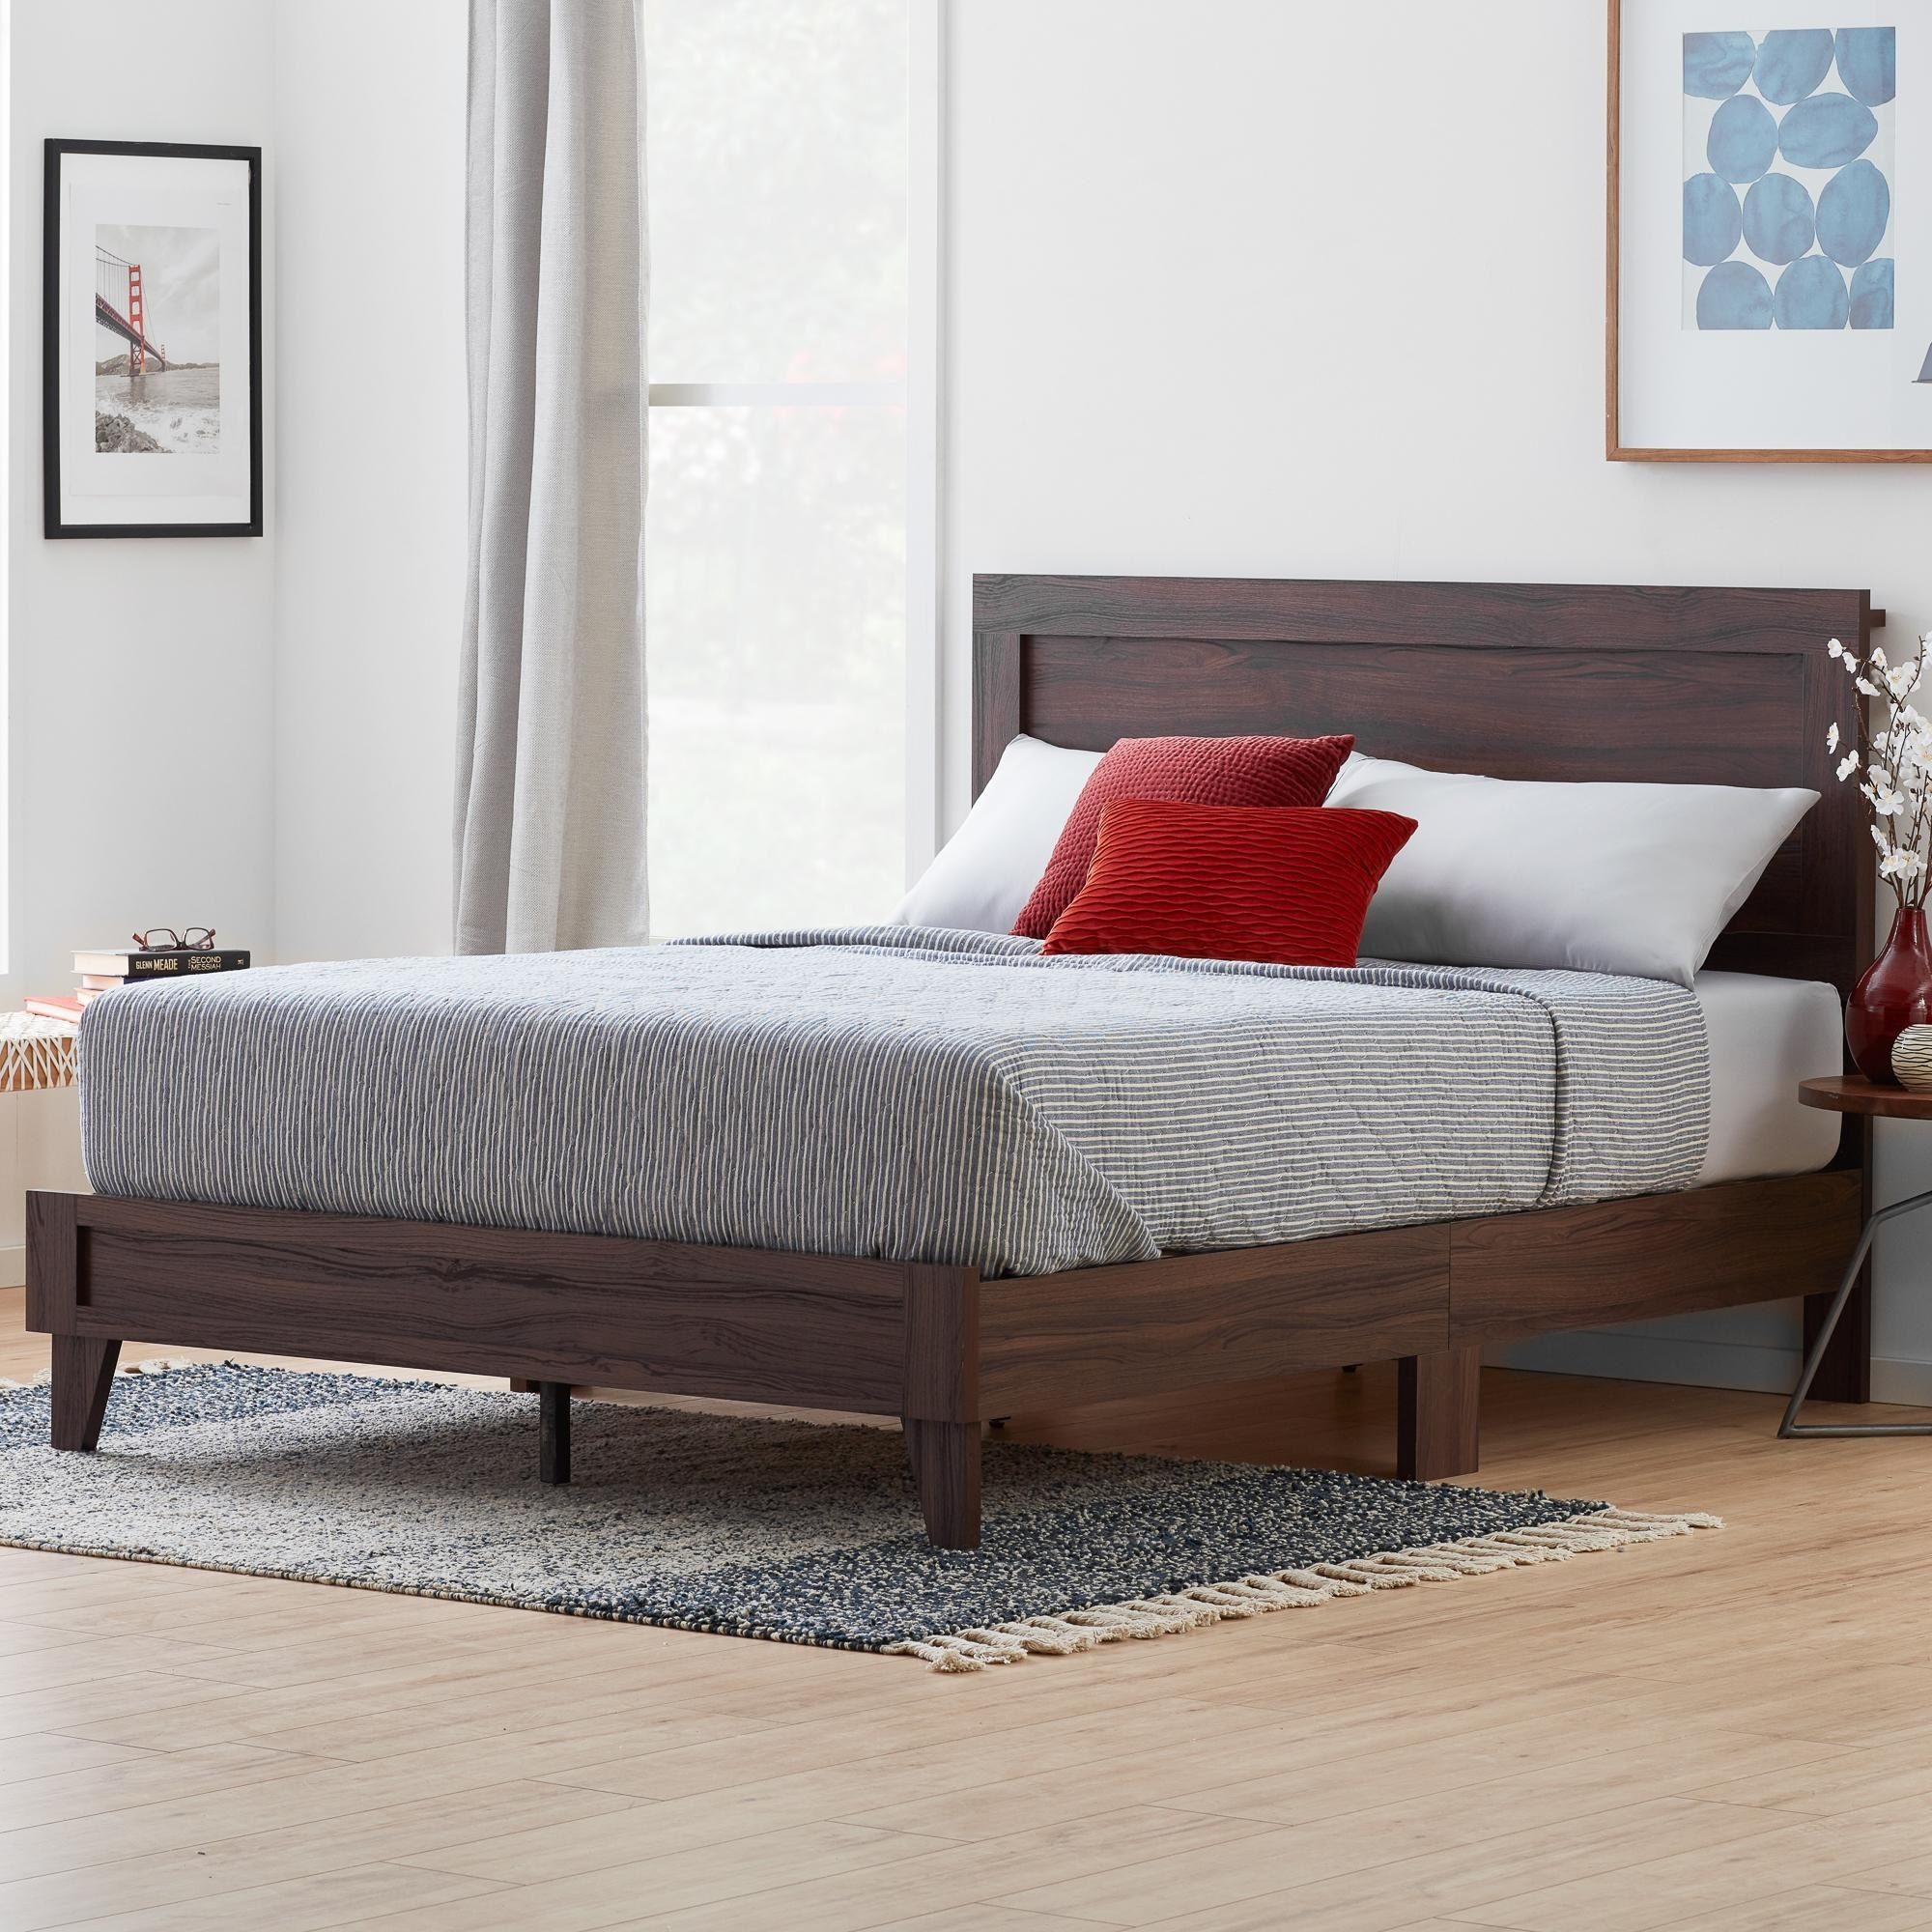 The dark brown bed in a bedroom